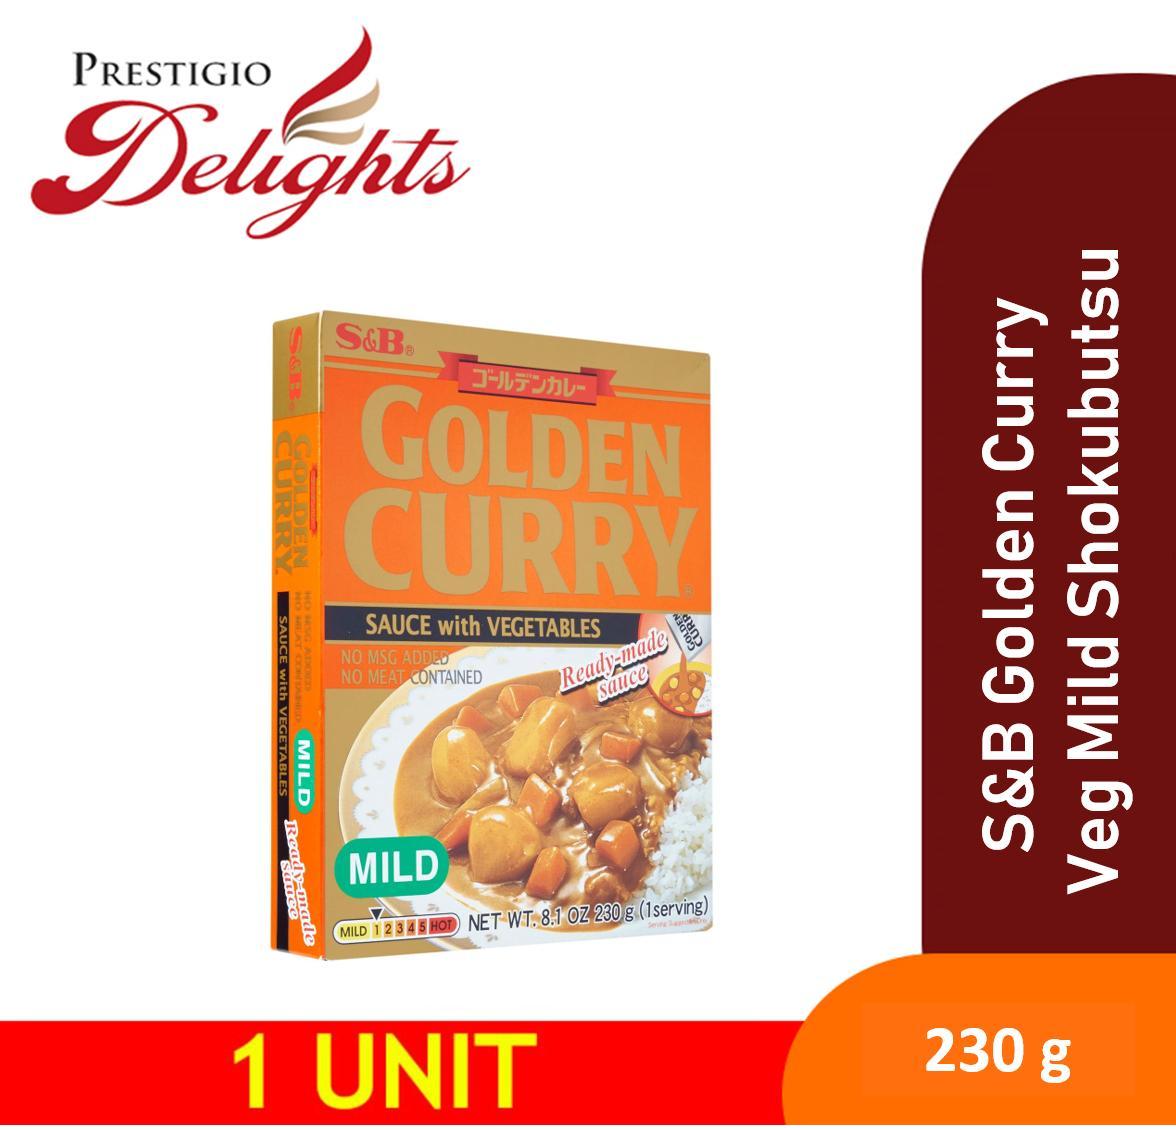 S&b Golden Curry With Vegetables Mild Shokubutsu 230g By Prestigio Delights.